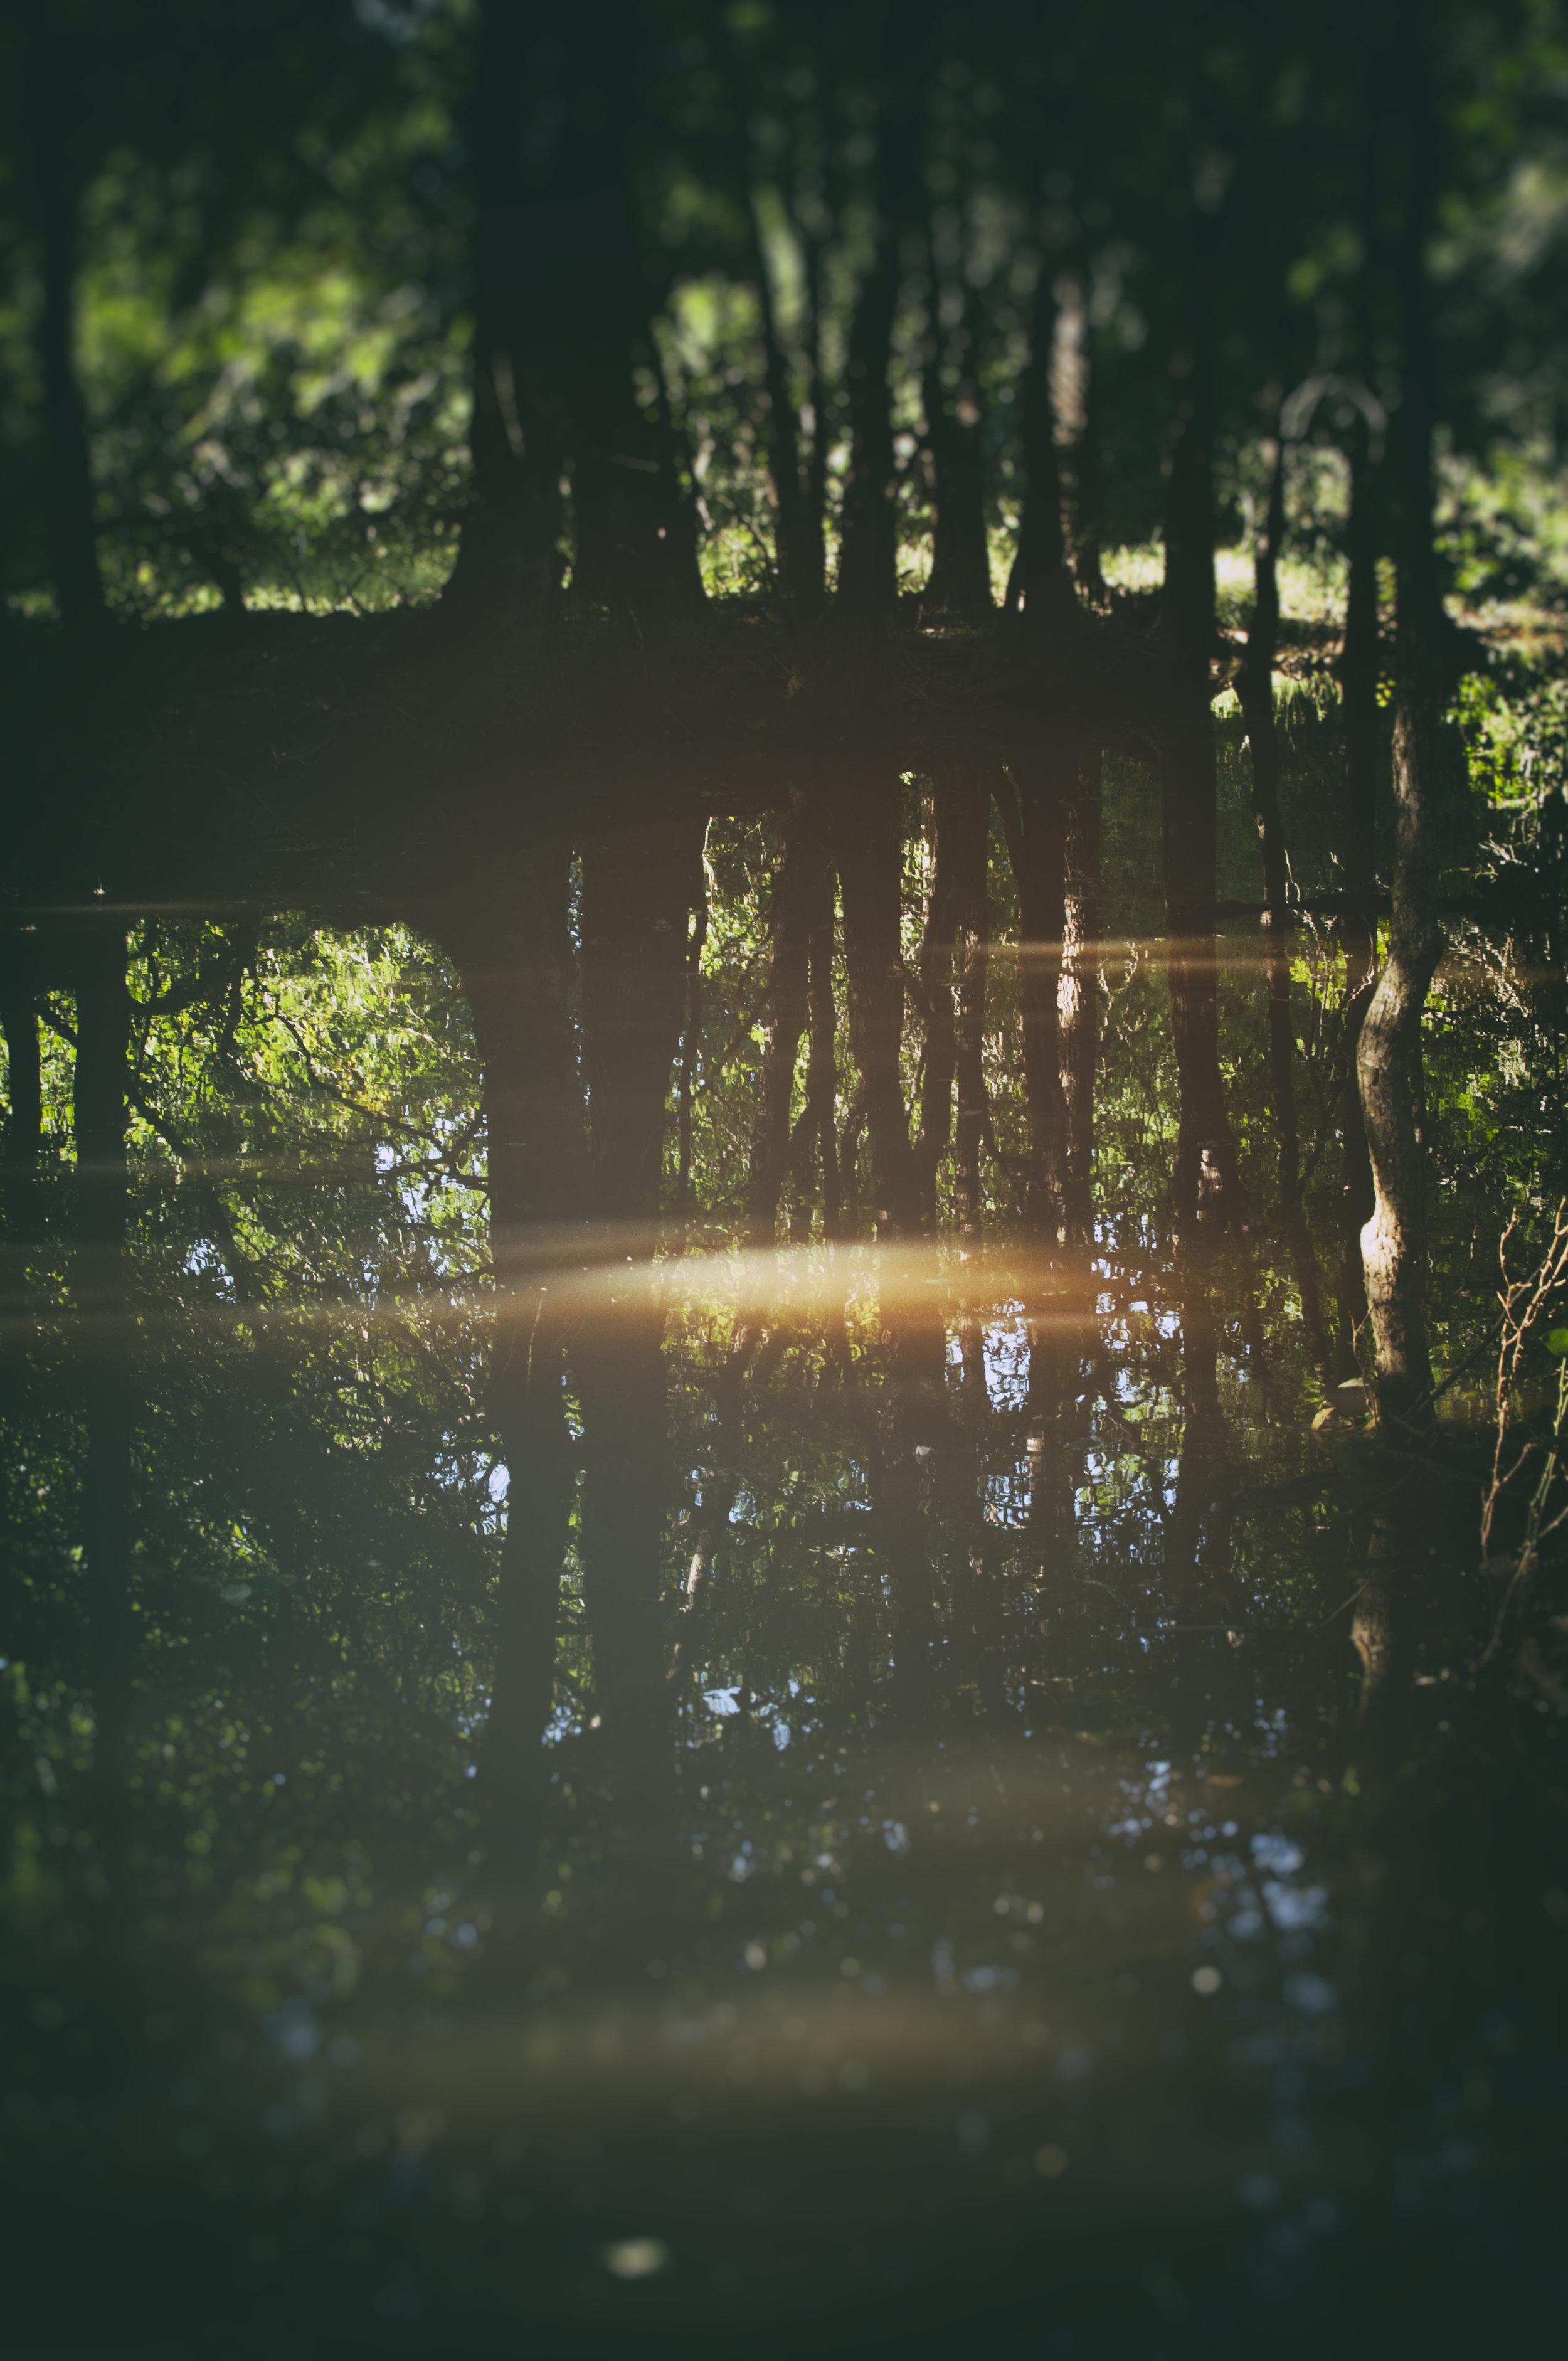 Landscape_Woods_TX002.jpg